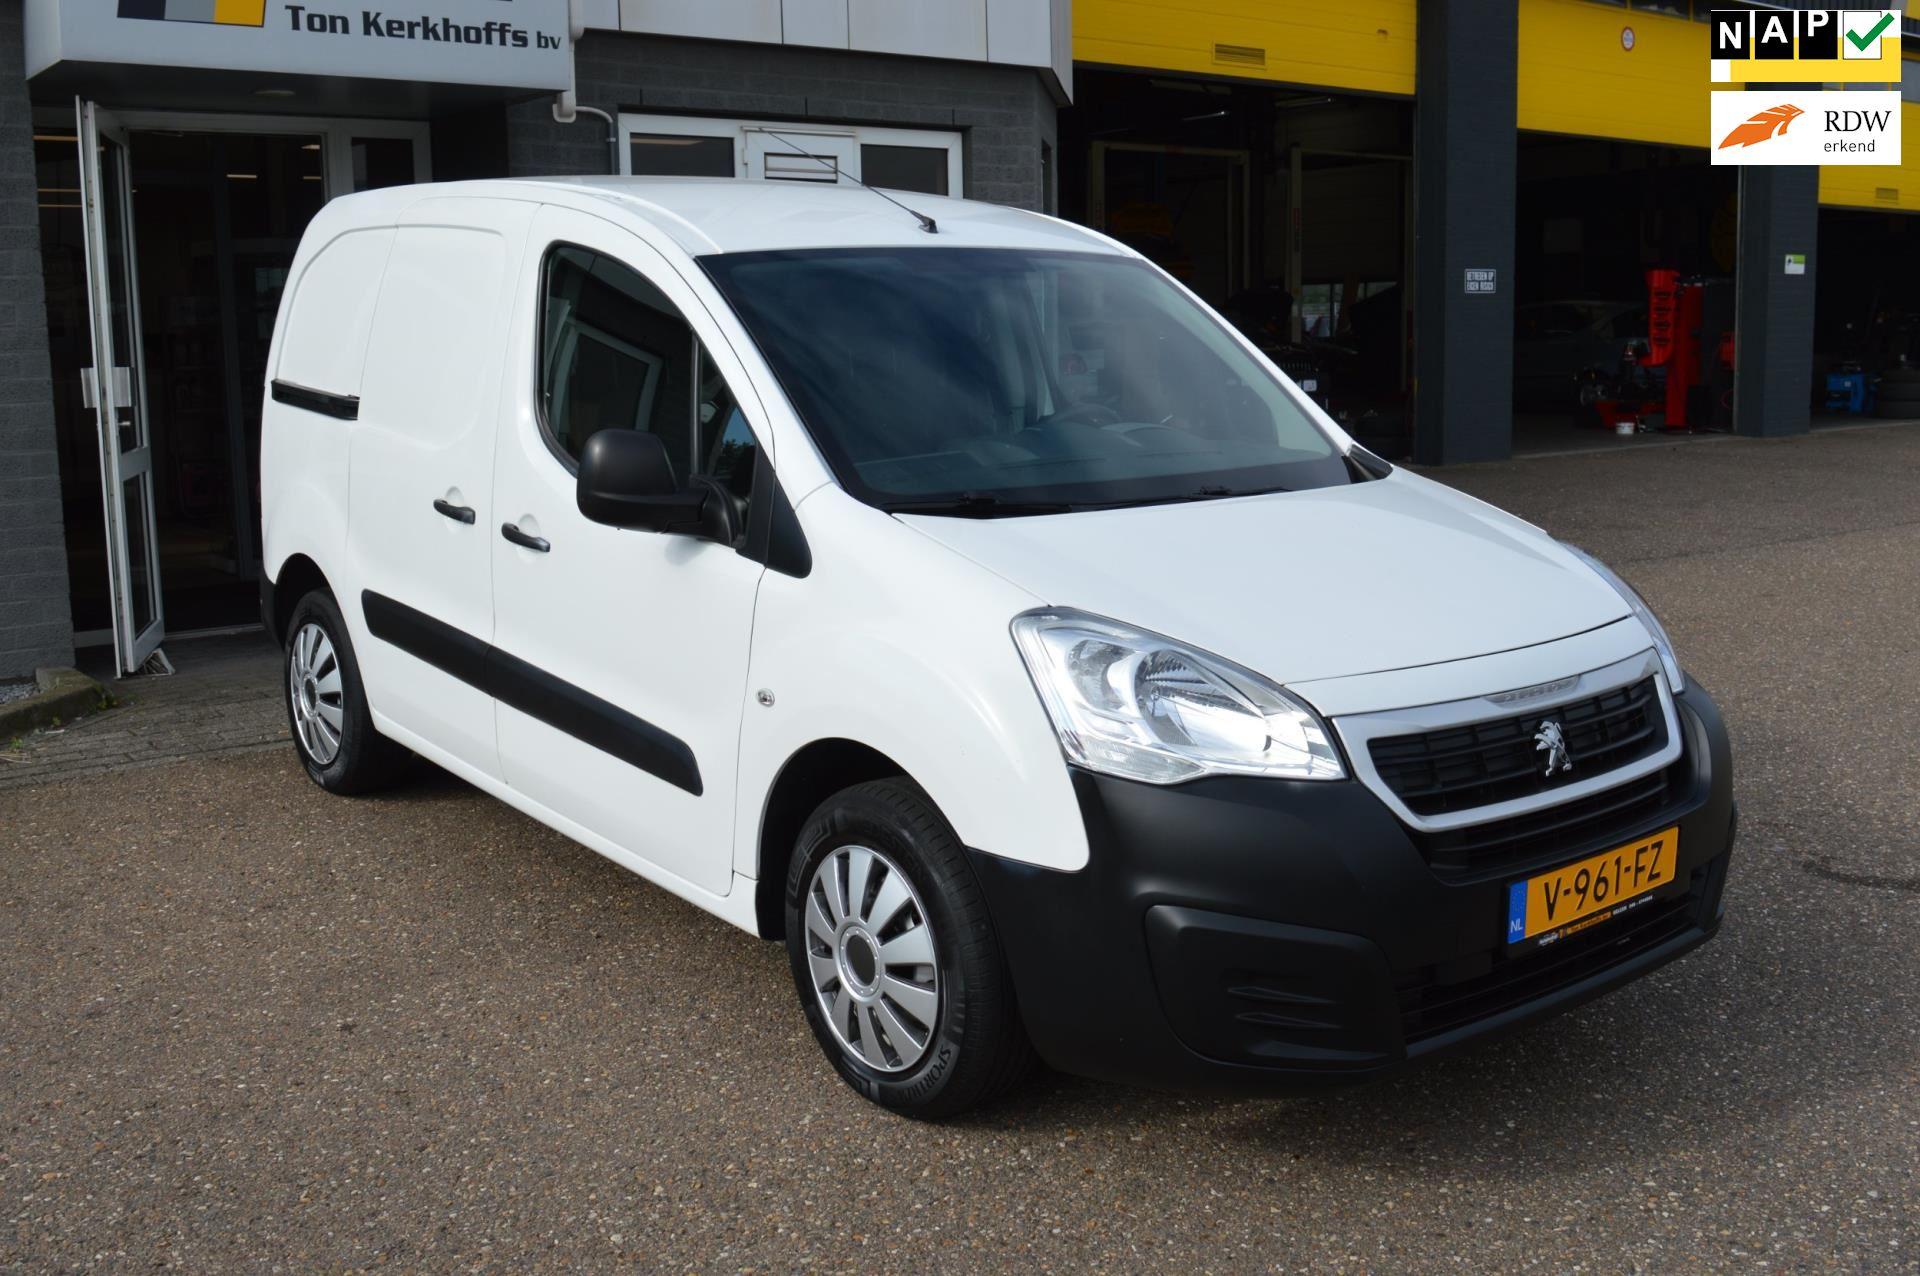 Peugeot Partner occasion - Autobedrijf Ton Kerkhoffs Bv